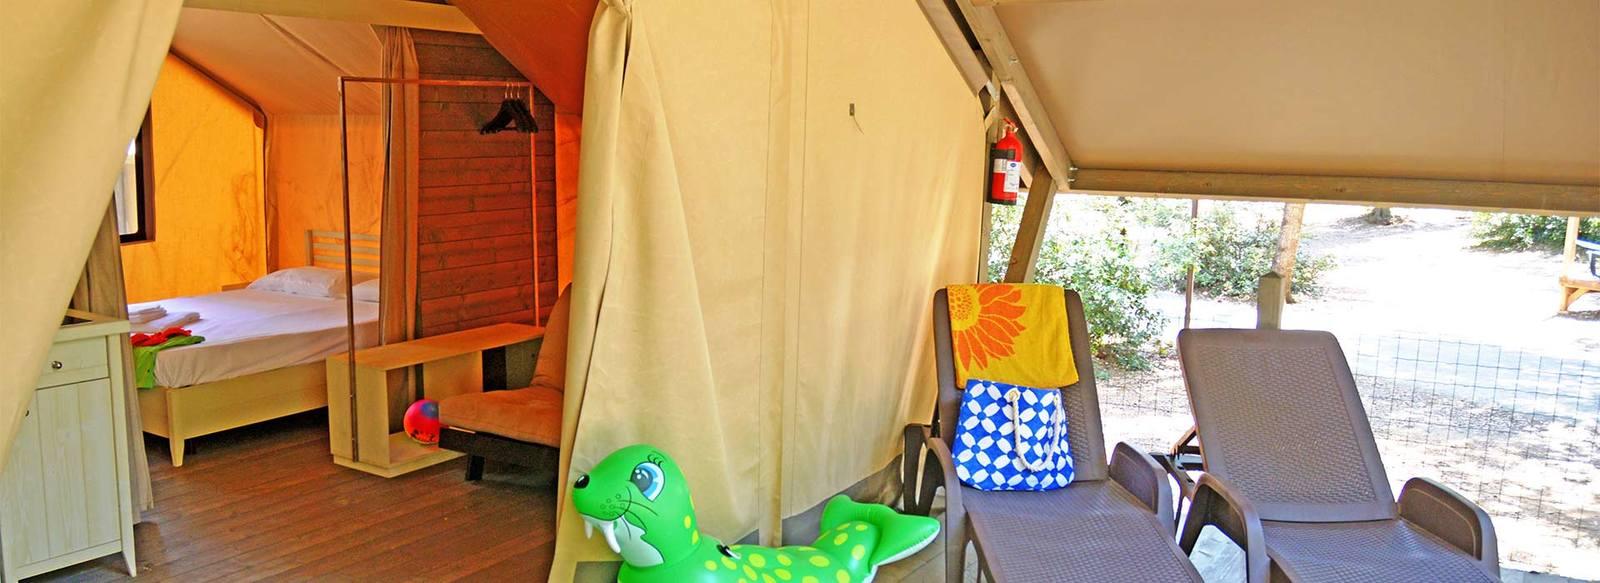 Glamping: Glamour & Camping tra mare e pineta